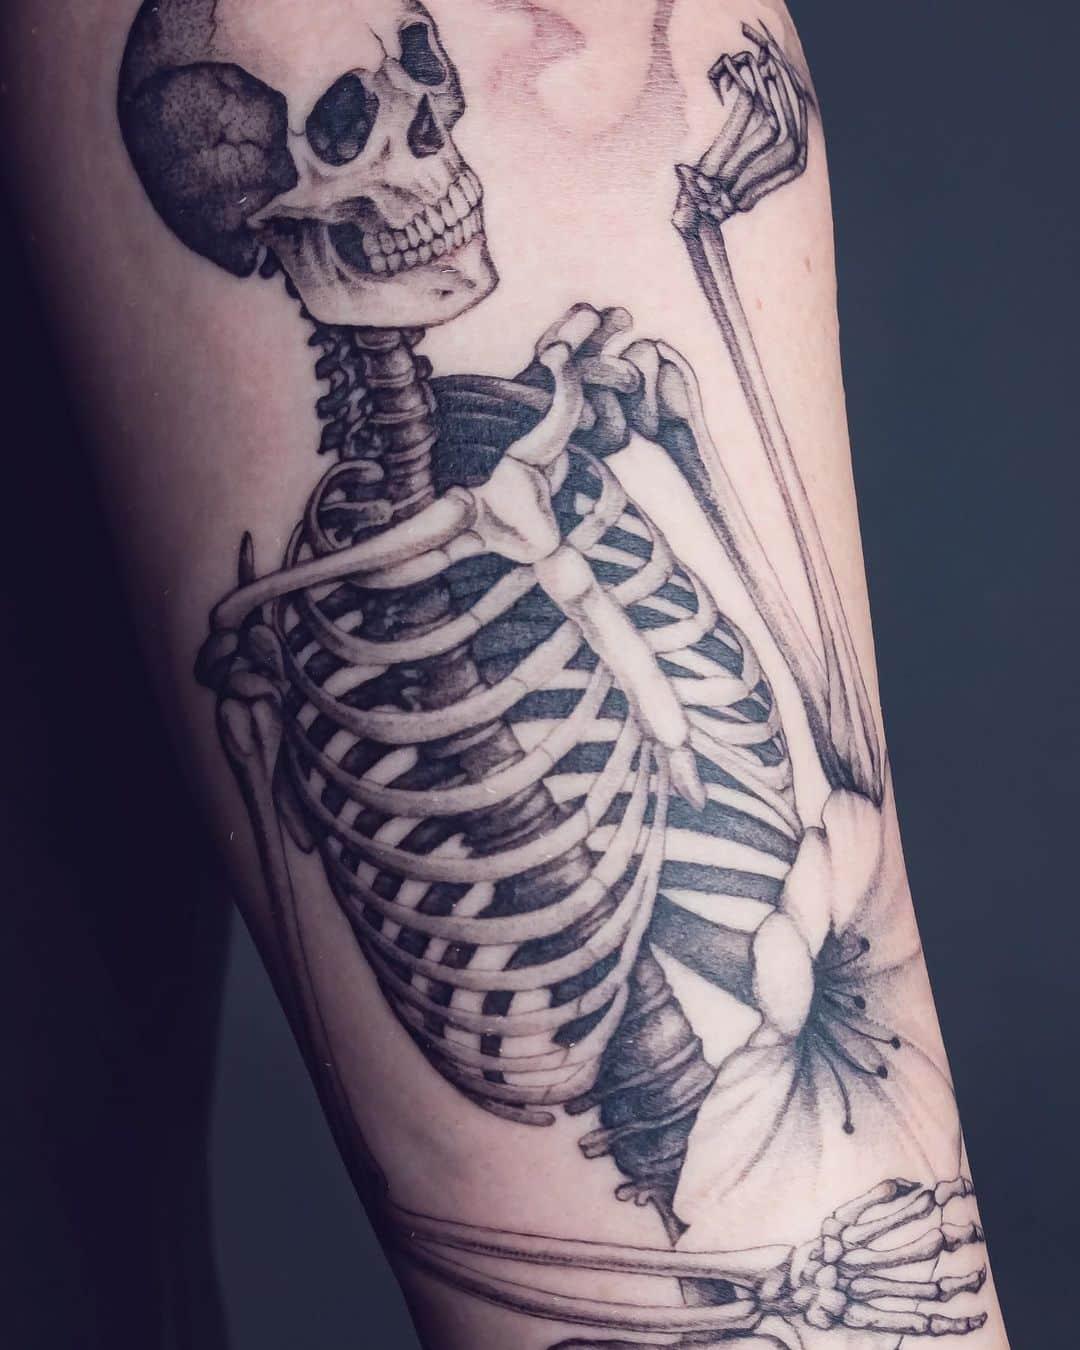 sara-fabel-tattoo-artist-skeleton-arm